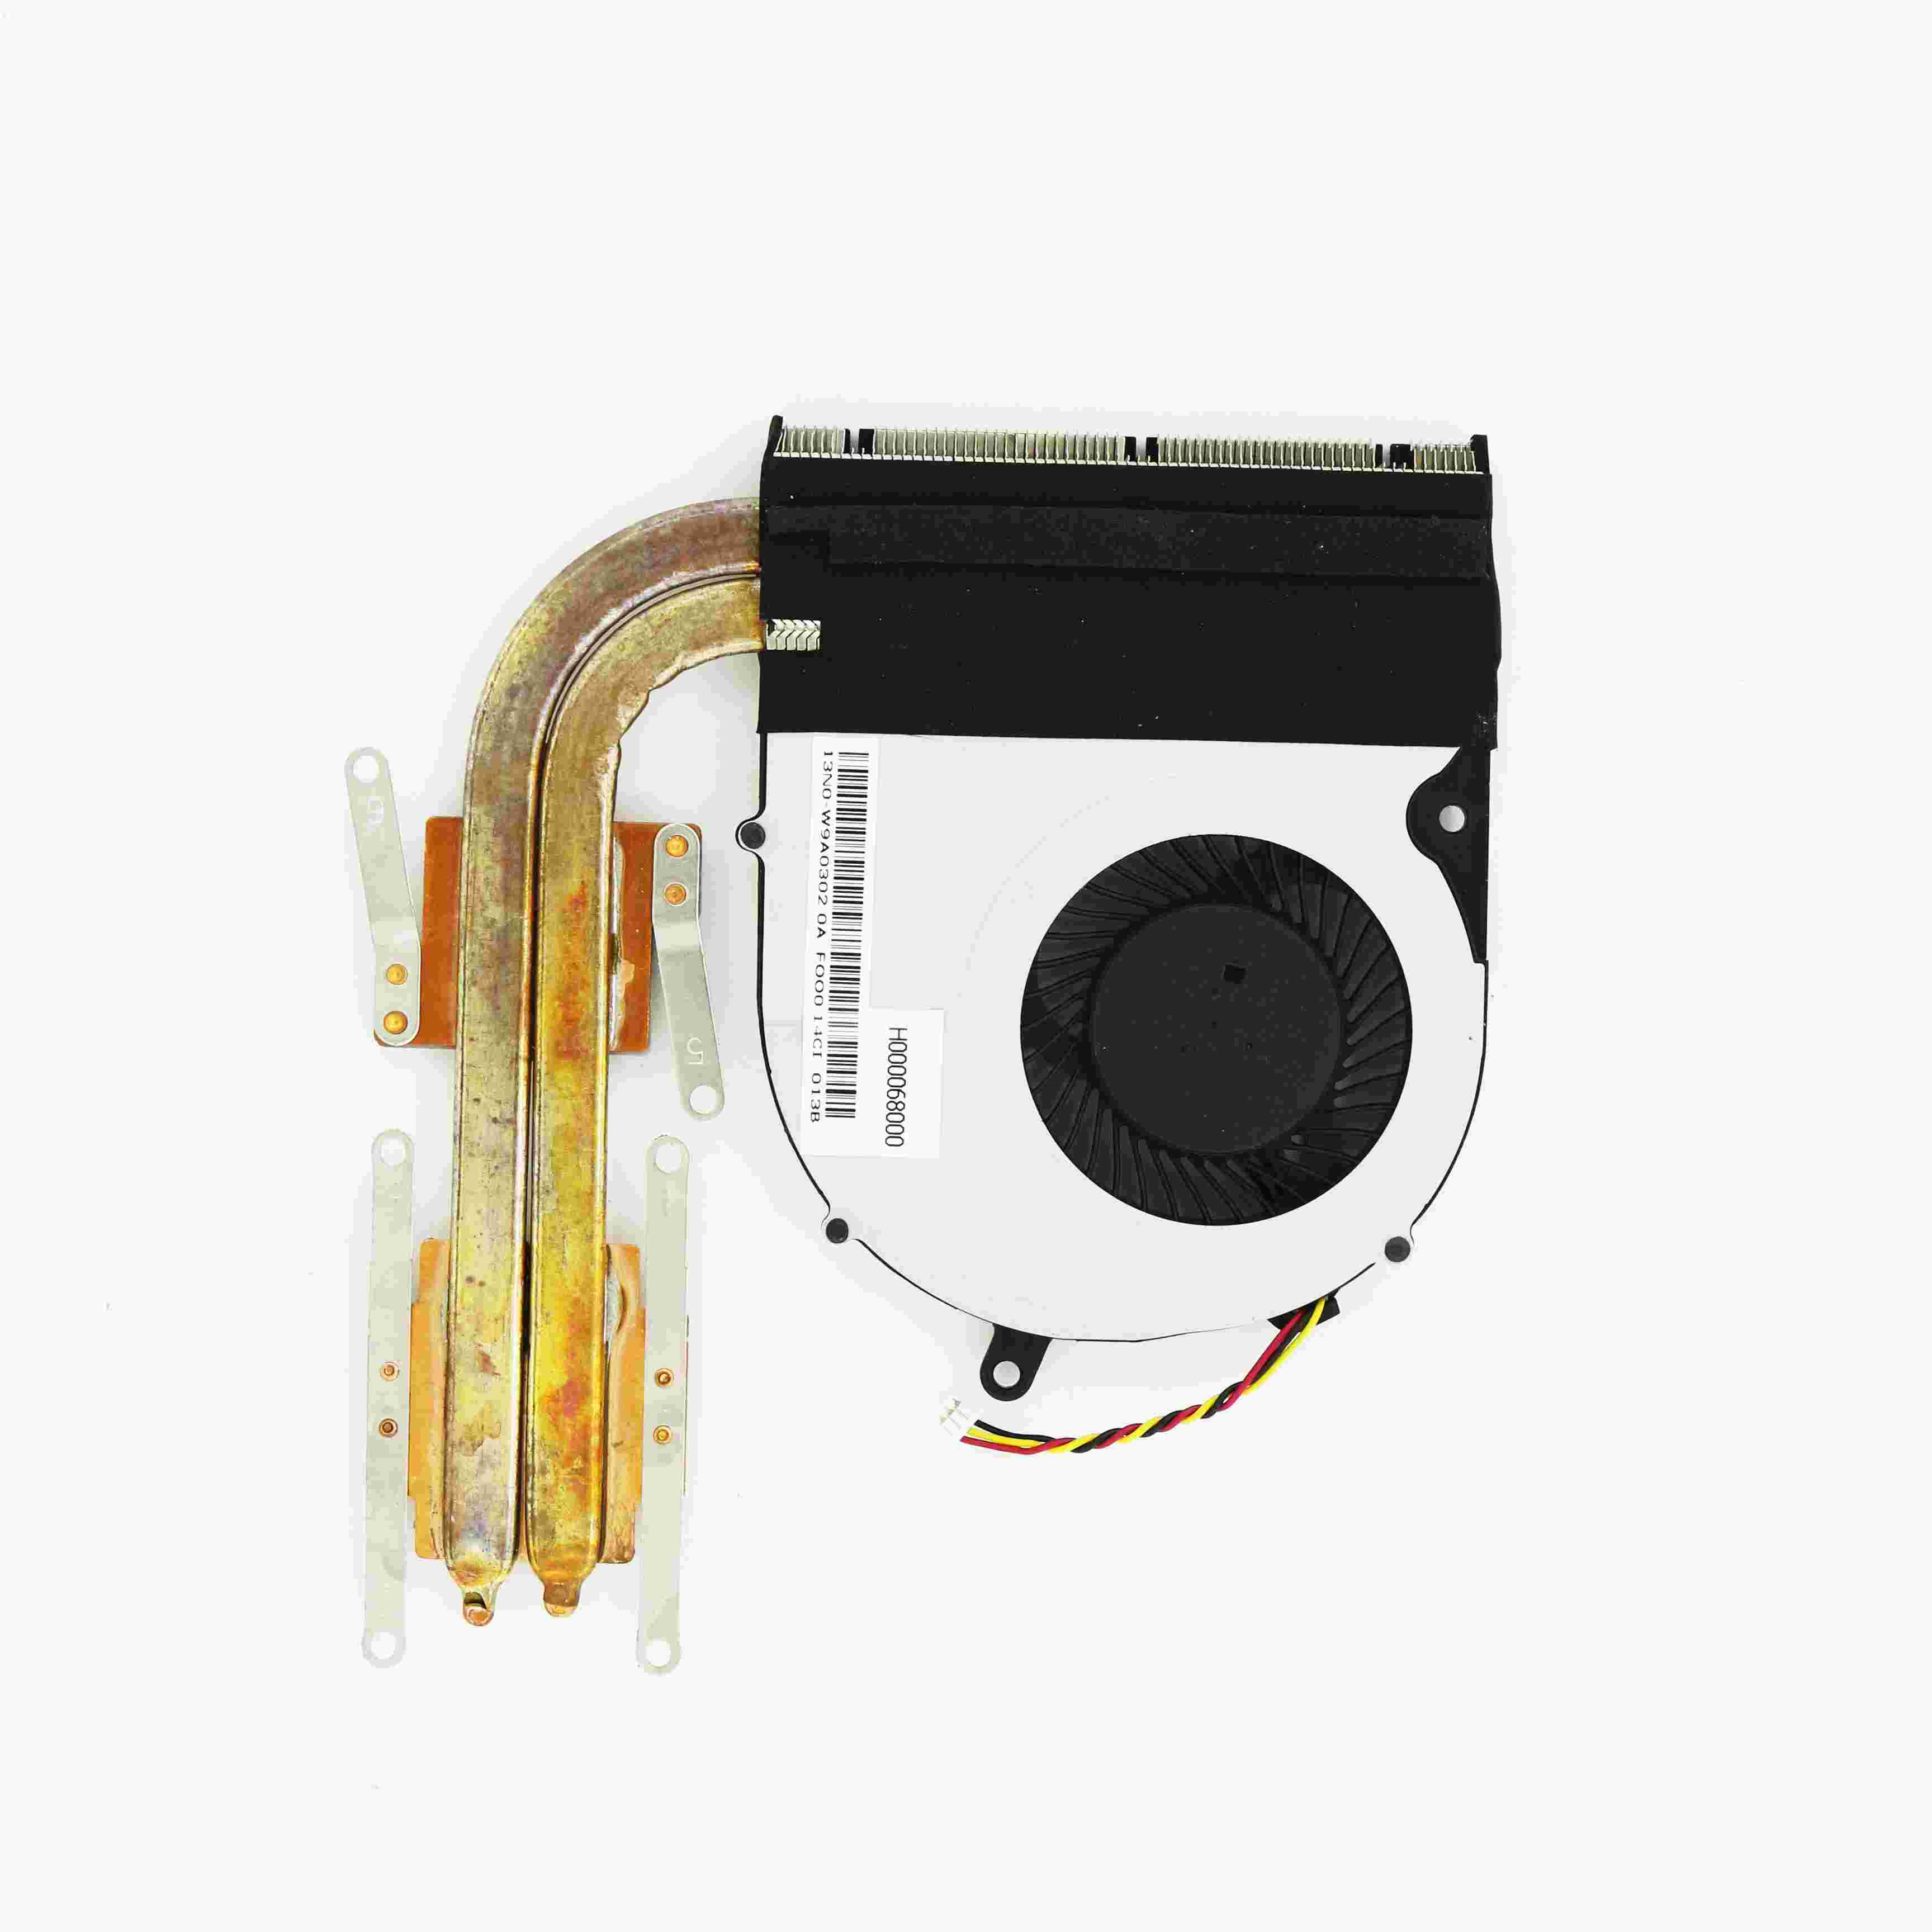 Heatsink Assembly Radiator Cooler 04w0343 landp-tech Laptop for Lenovo Thinkpad E30 CPU Cooling Fan